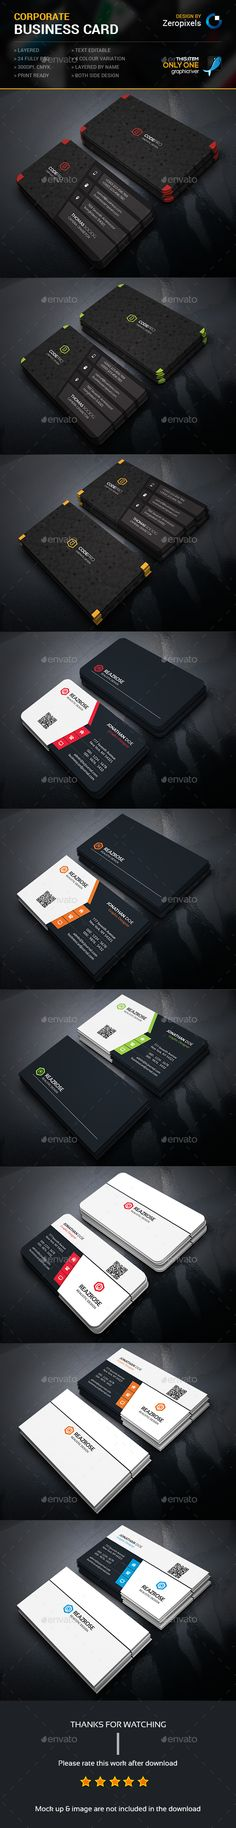 Corporate Business Card Bundle Templates PSD. Download here: http://graphicriver.net/item/corporate-business-card-bundle/16163930?ref=ksioks